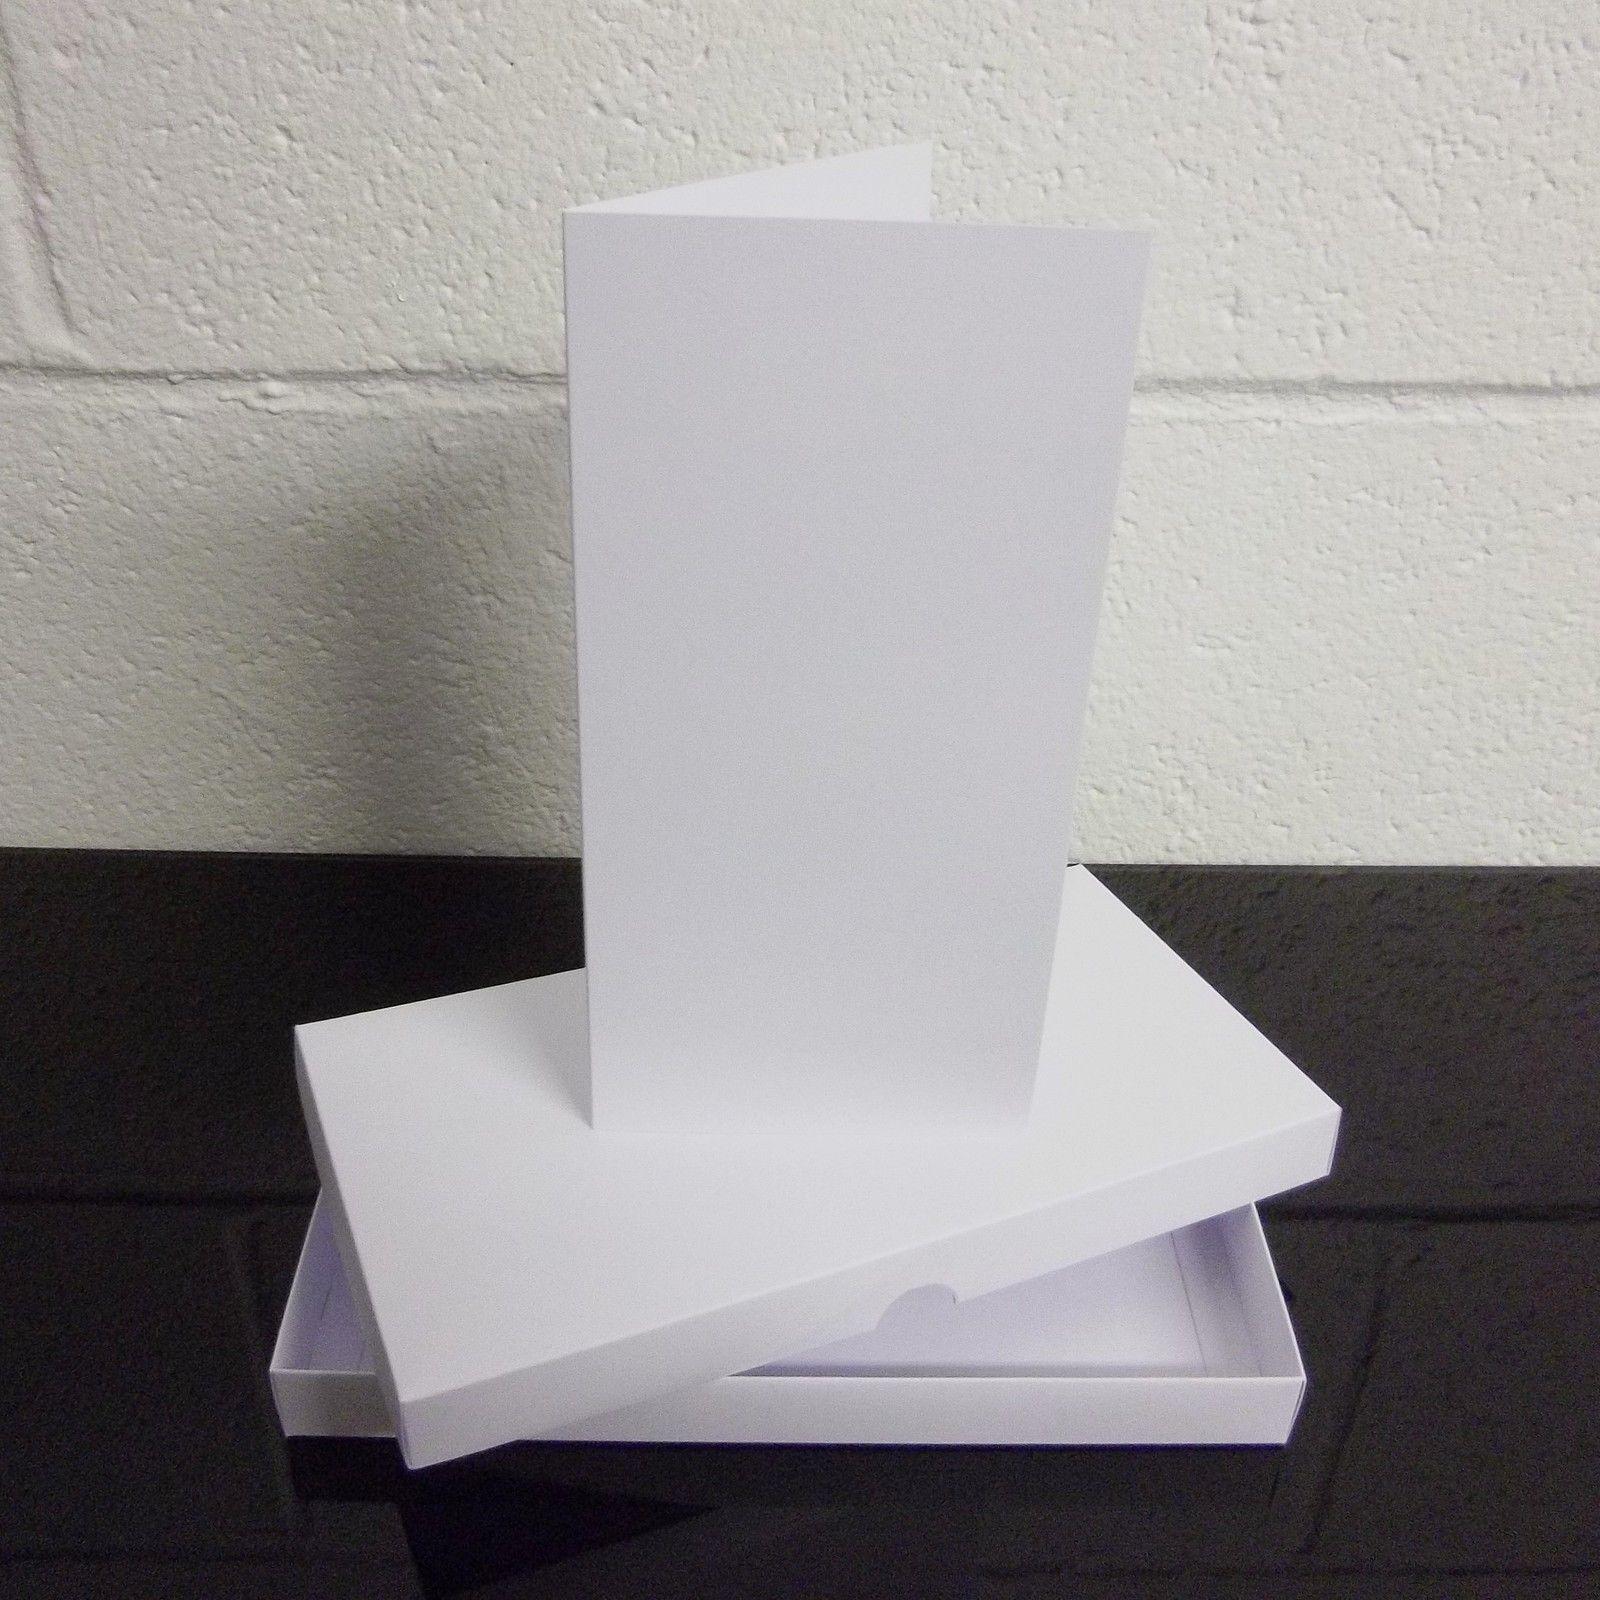 DL Weiß Greeting Greeting Greeting Card Box   Wedding Invite Box With Card Blanks Choose Qty c92913